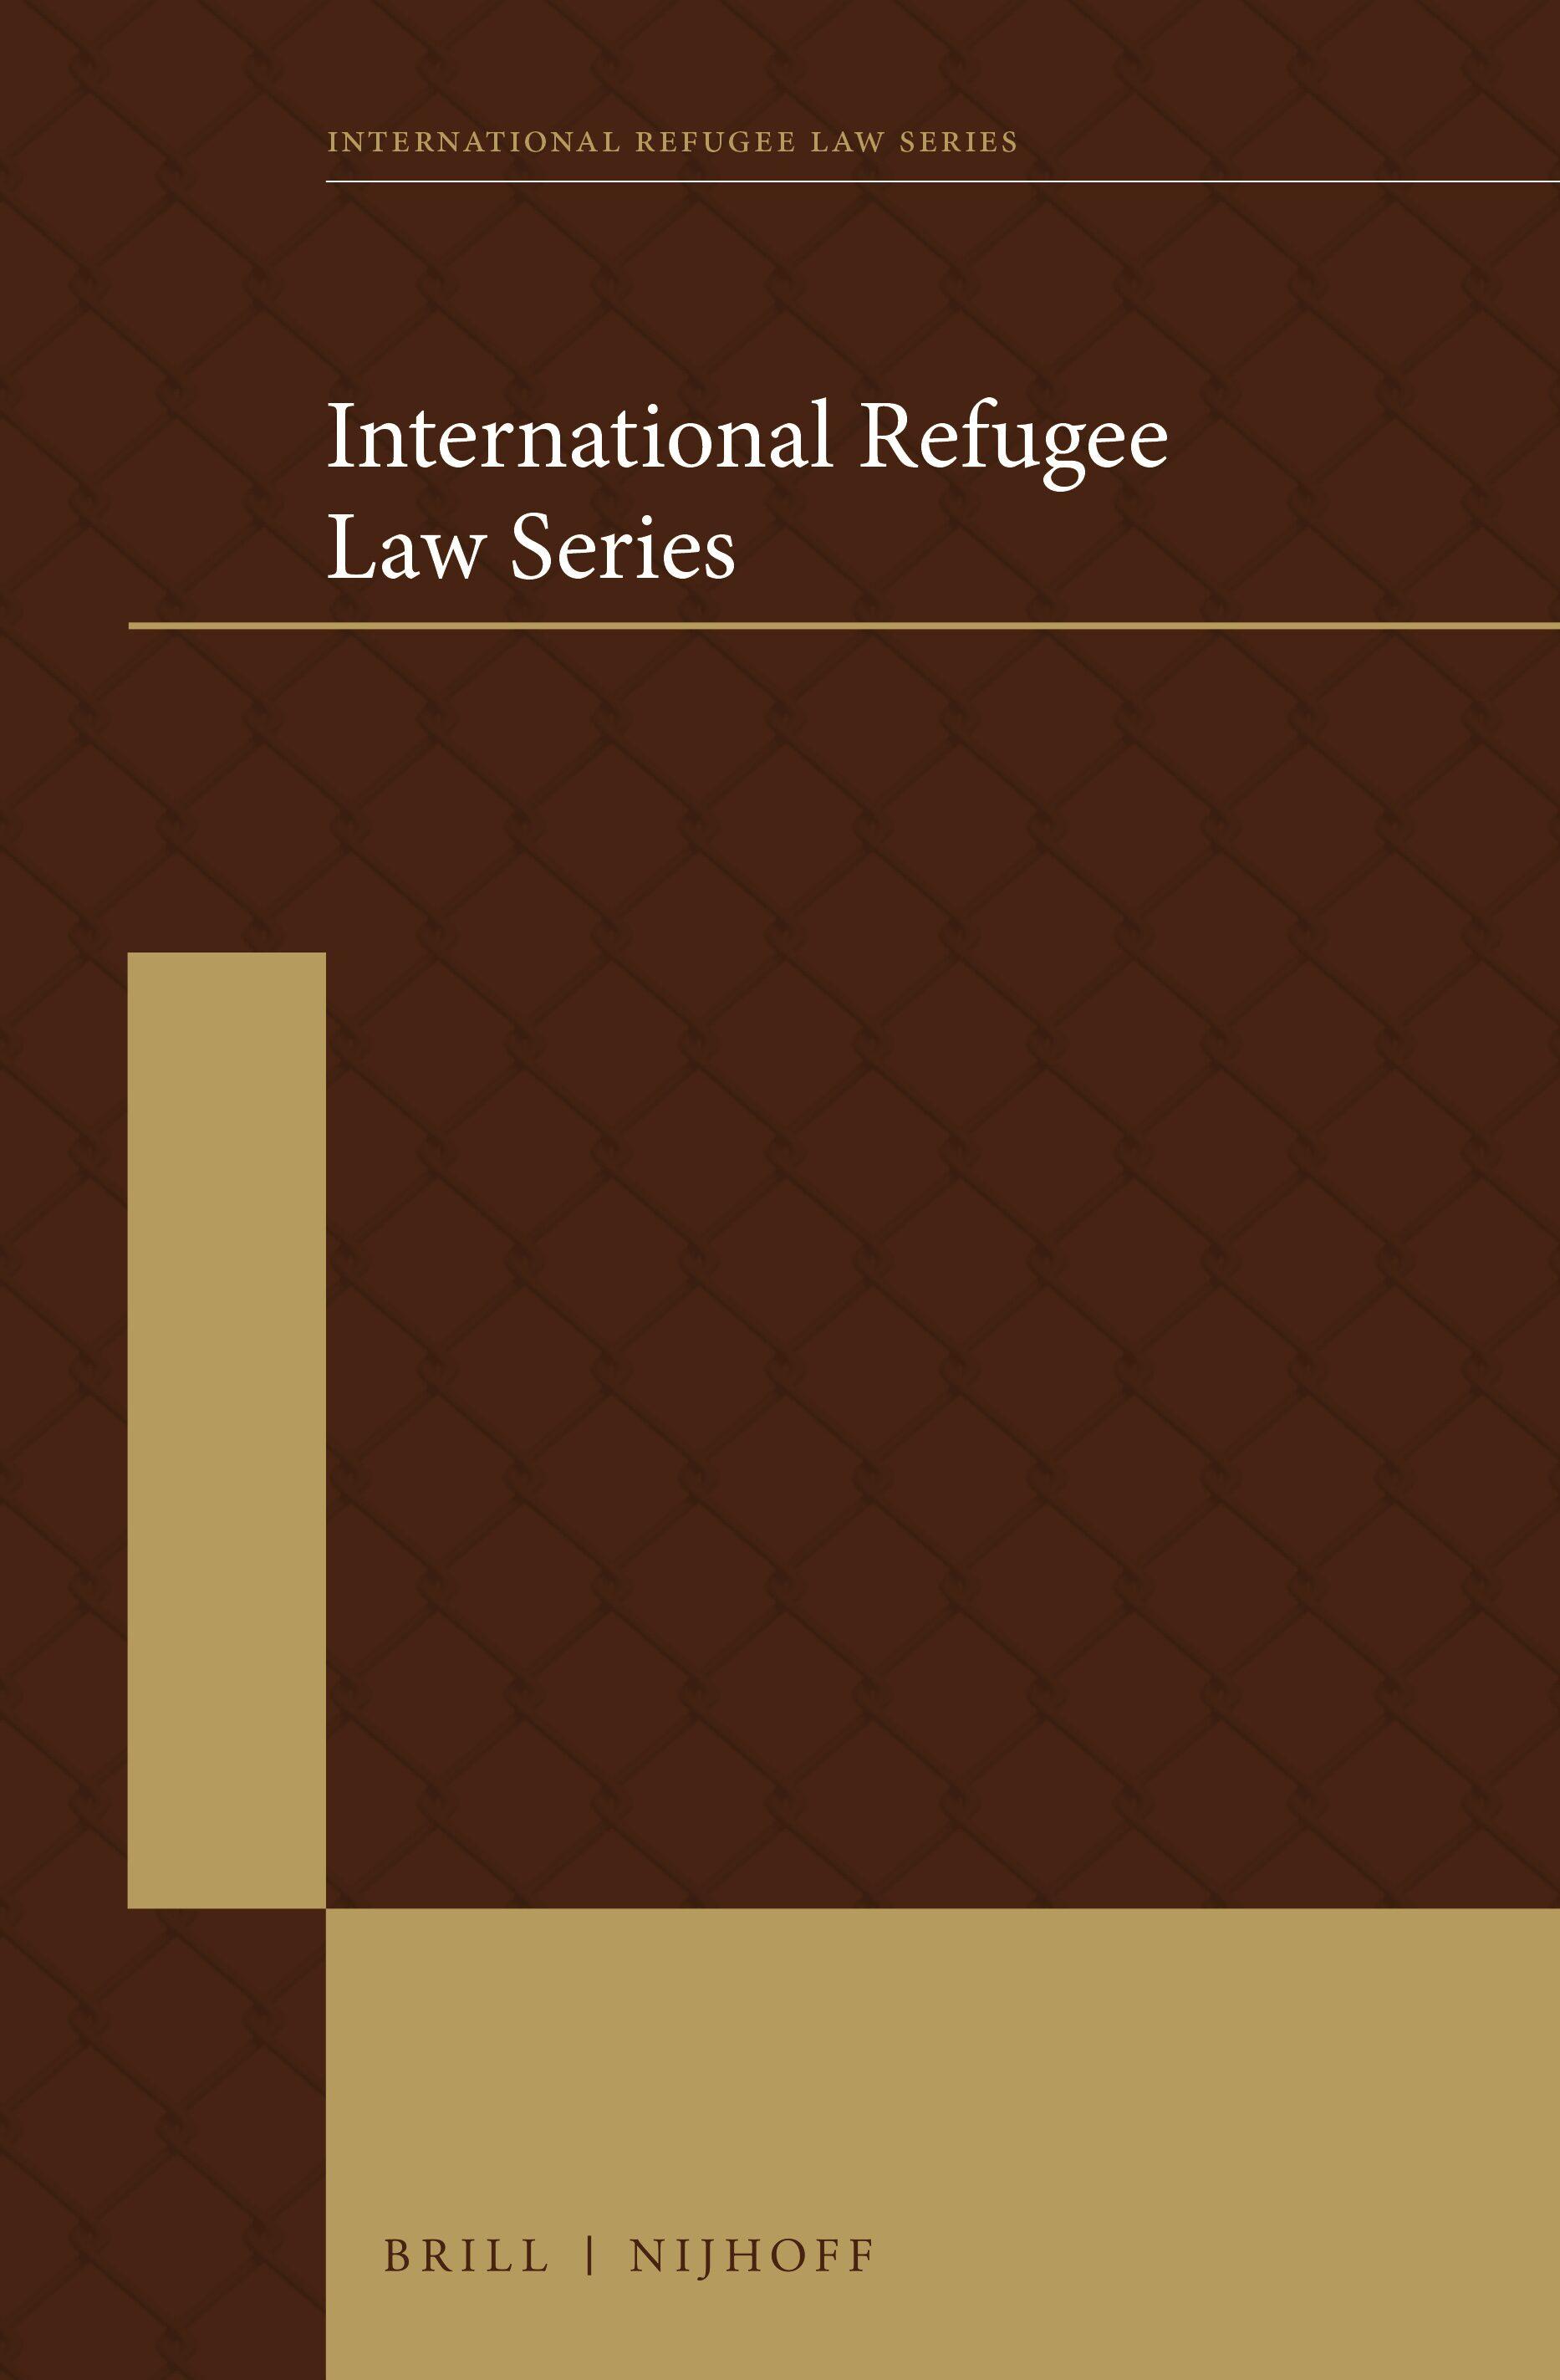 International Refugee Law Series